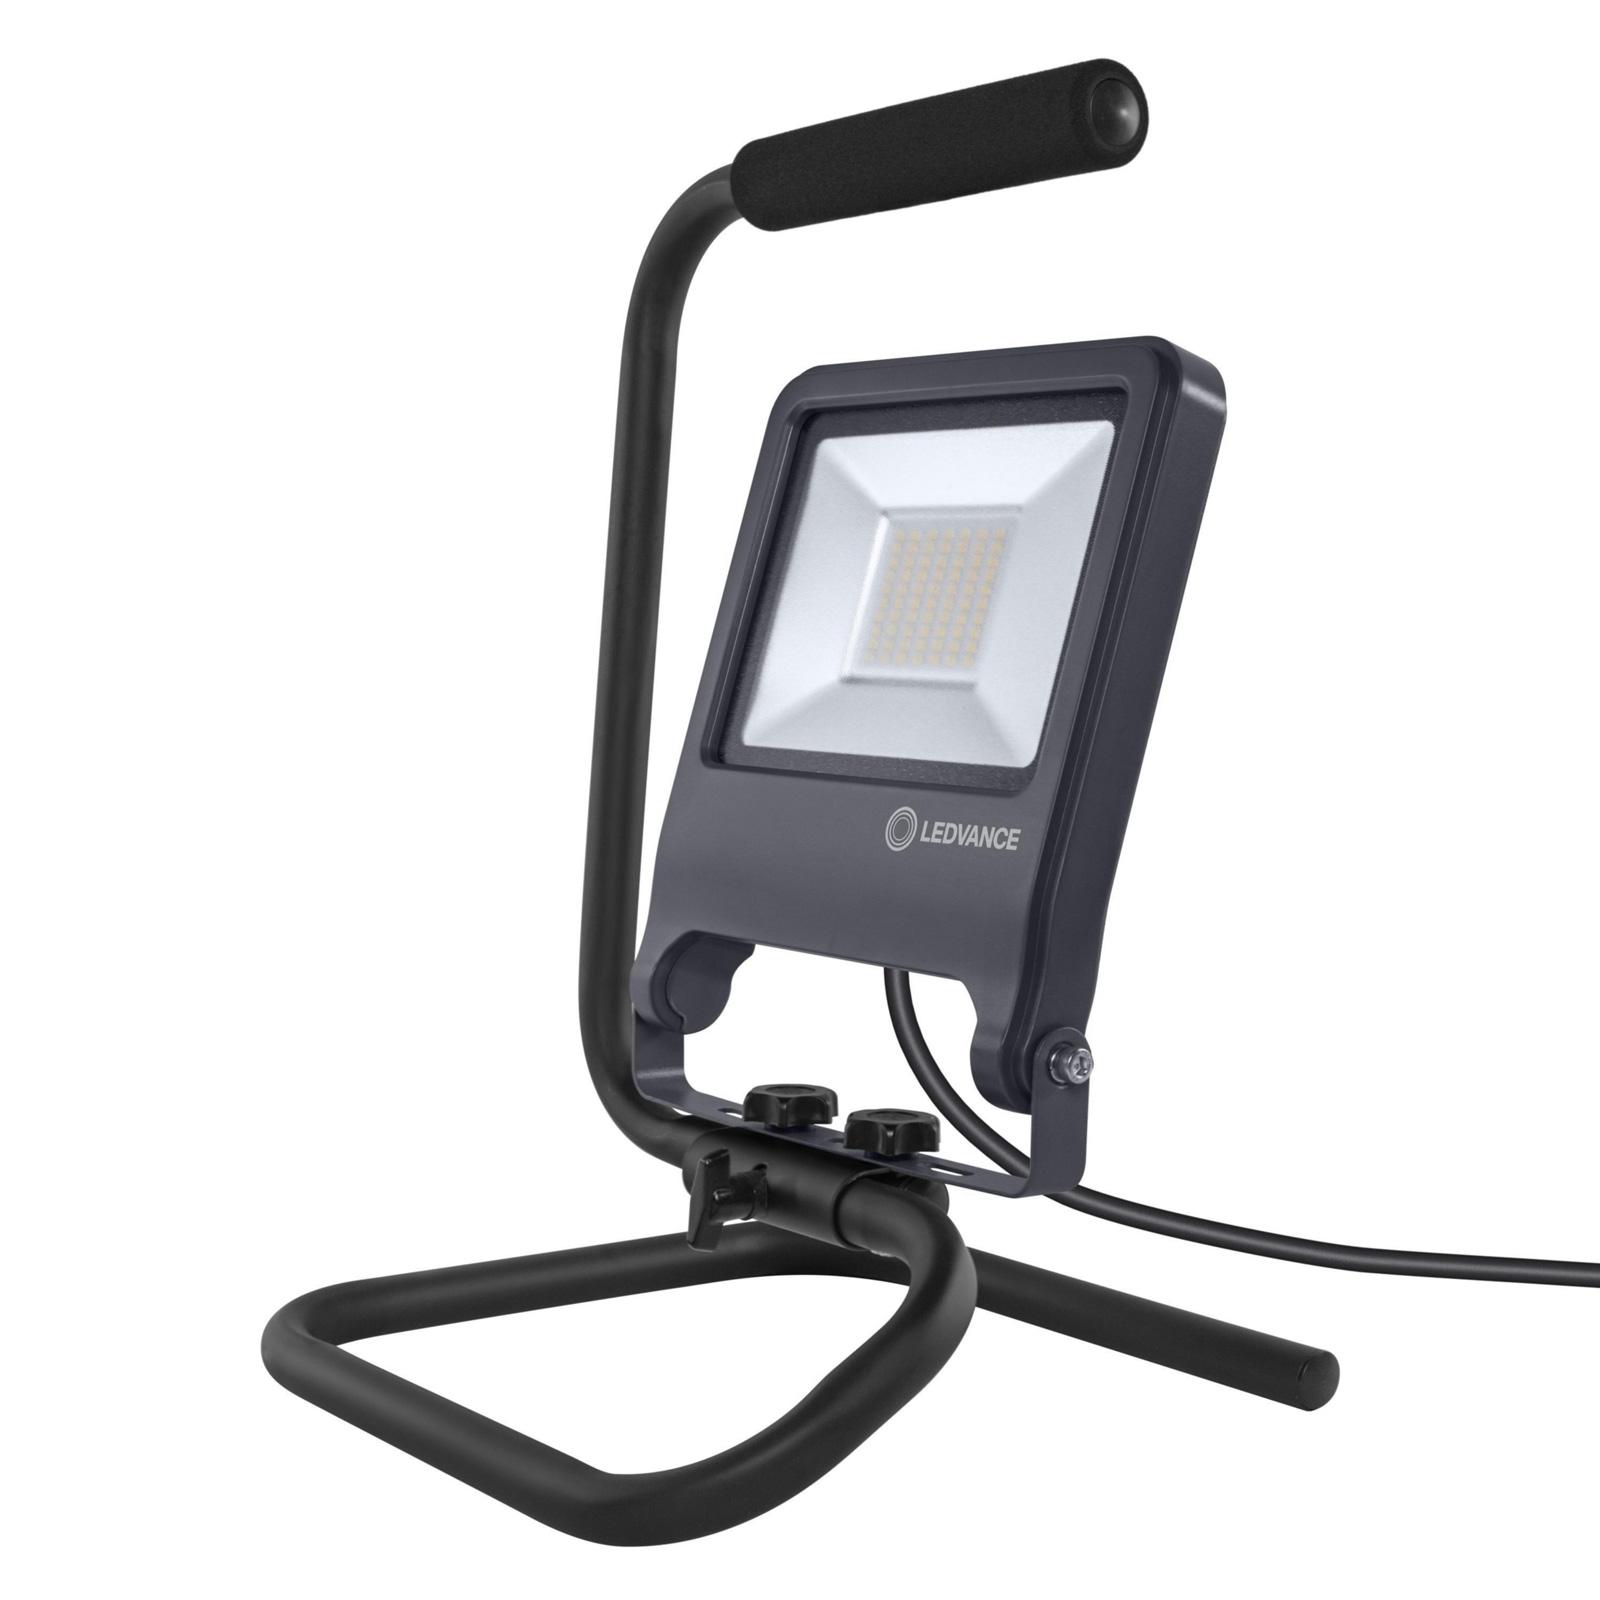 LEDVANCE Worklight S-Stand LED-Arbeitsleuchte 50W